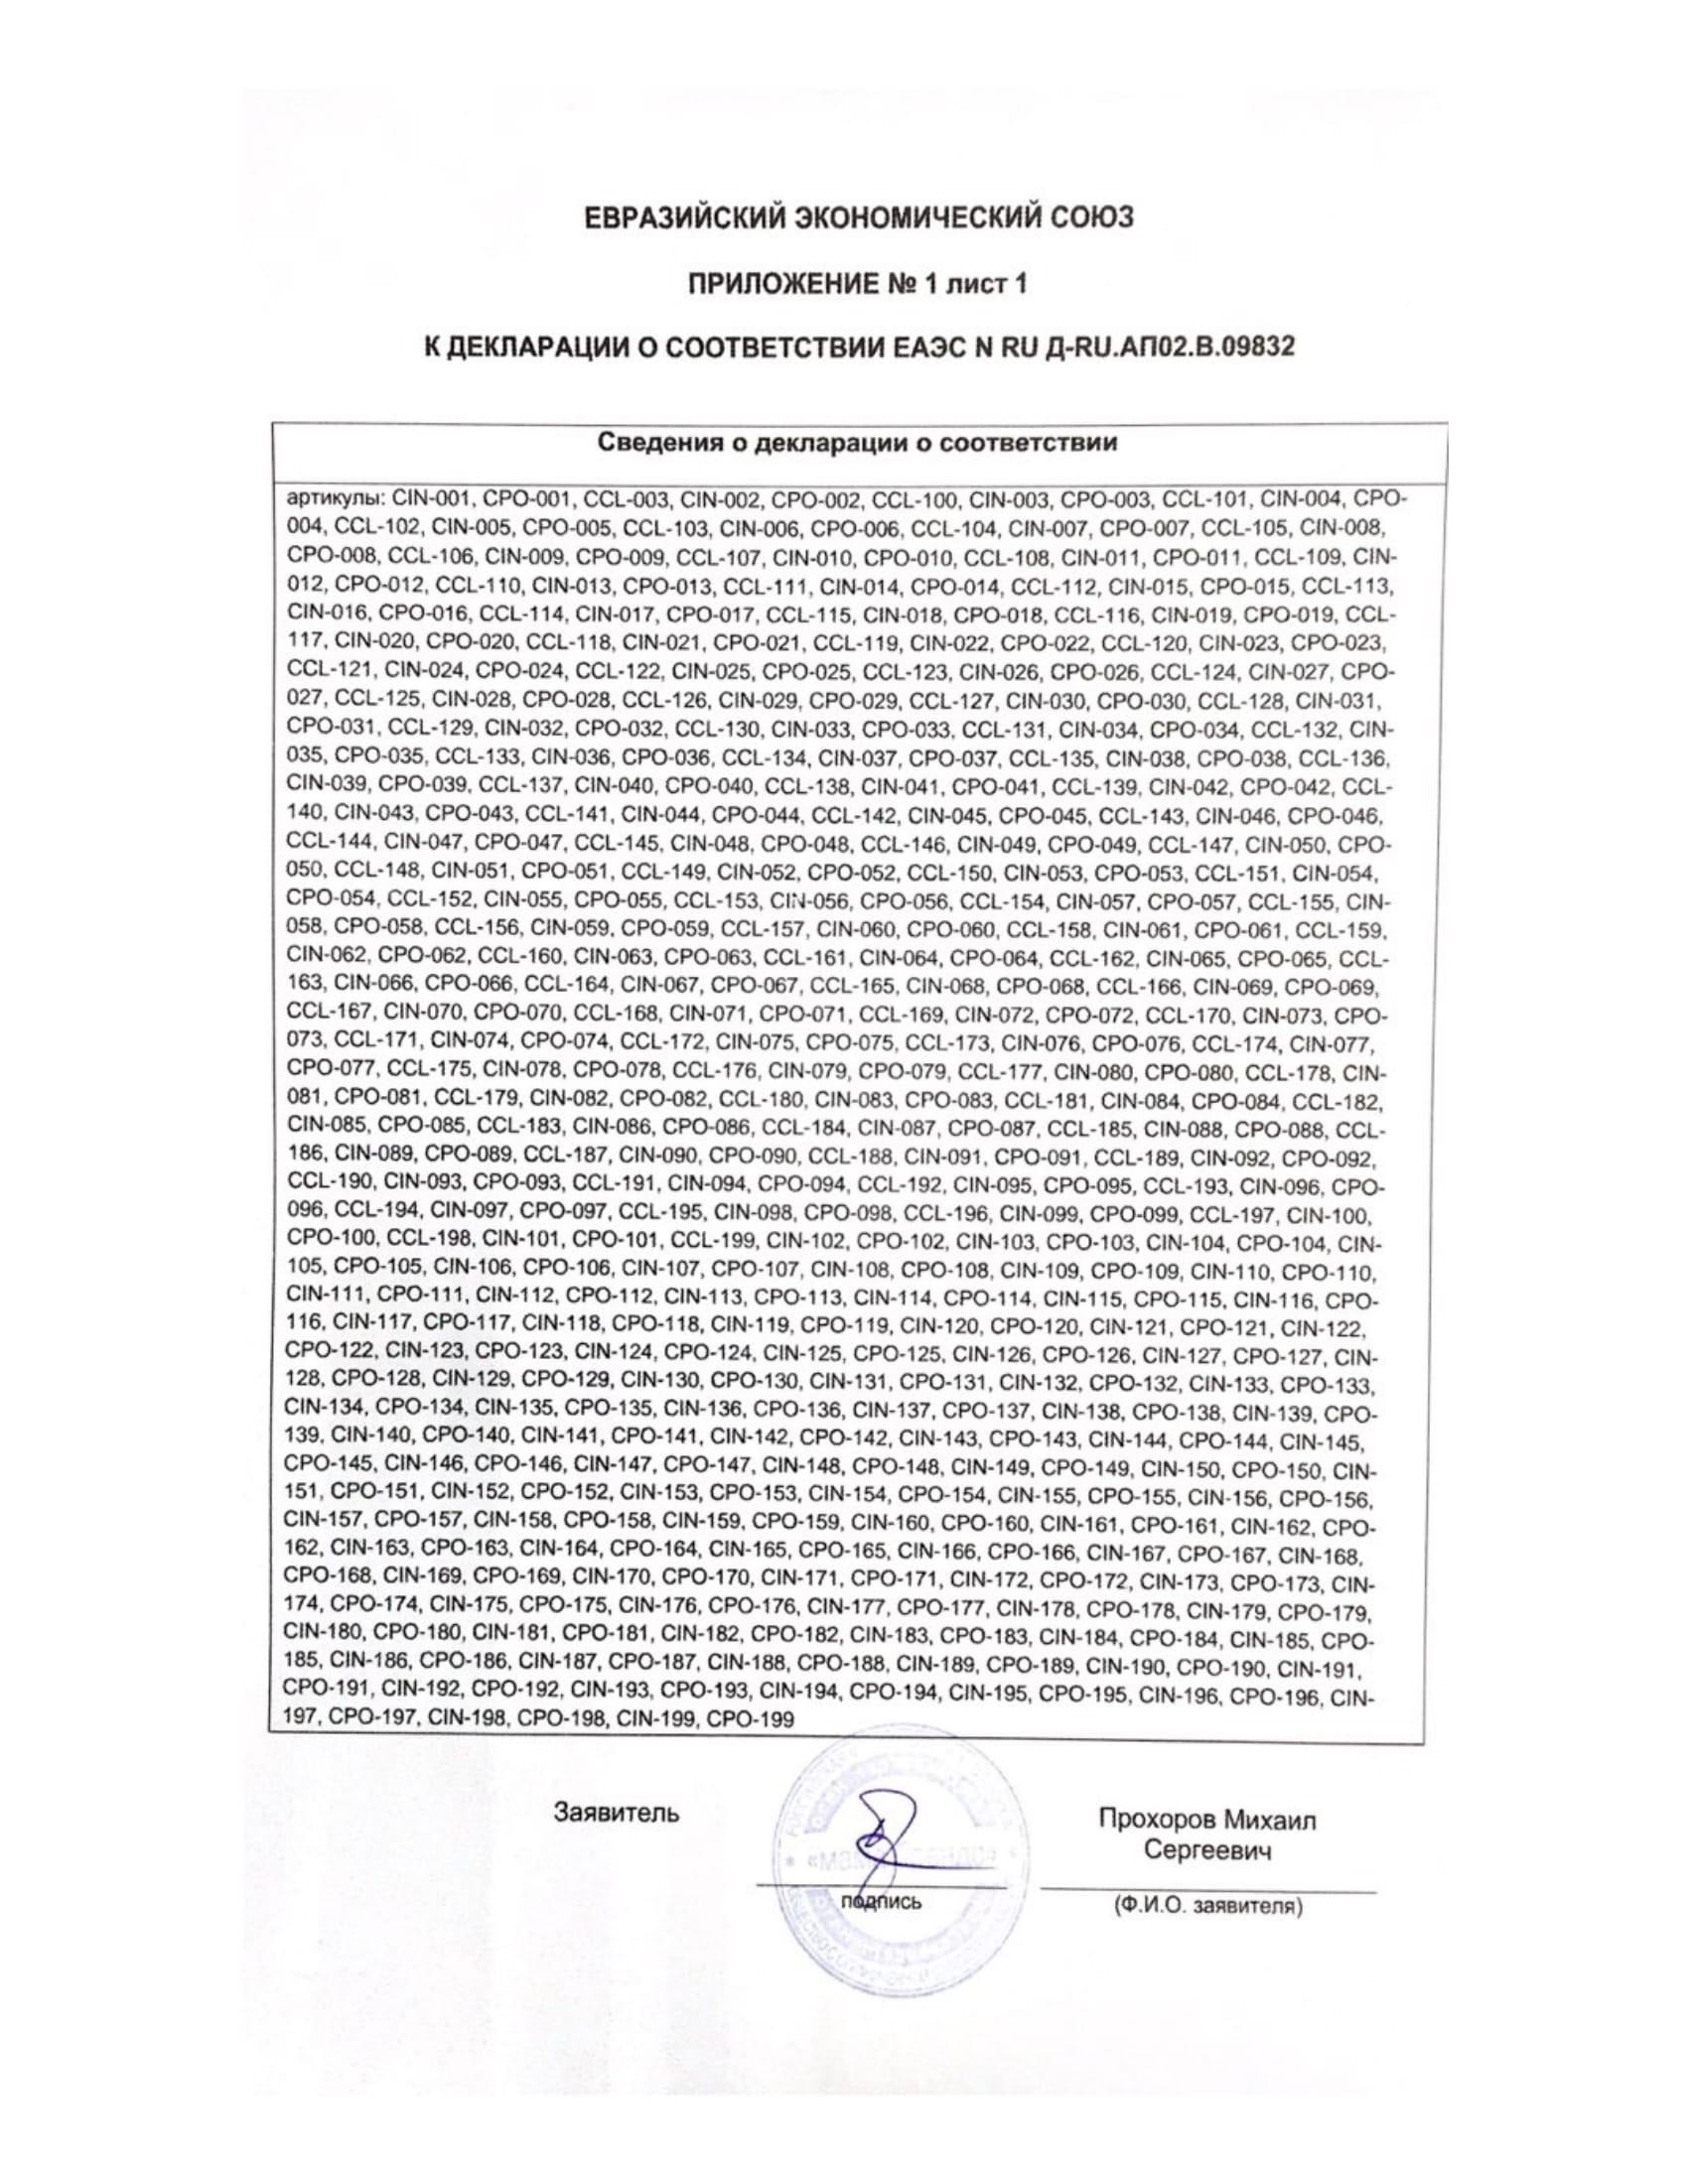 ЕАЭС N RU Д-RU.АП02.В.09832-2